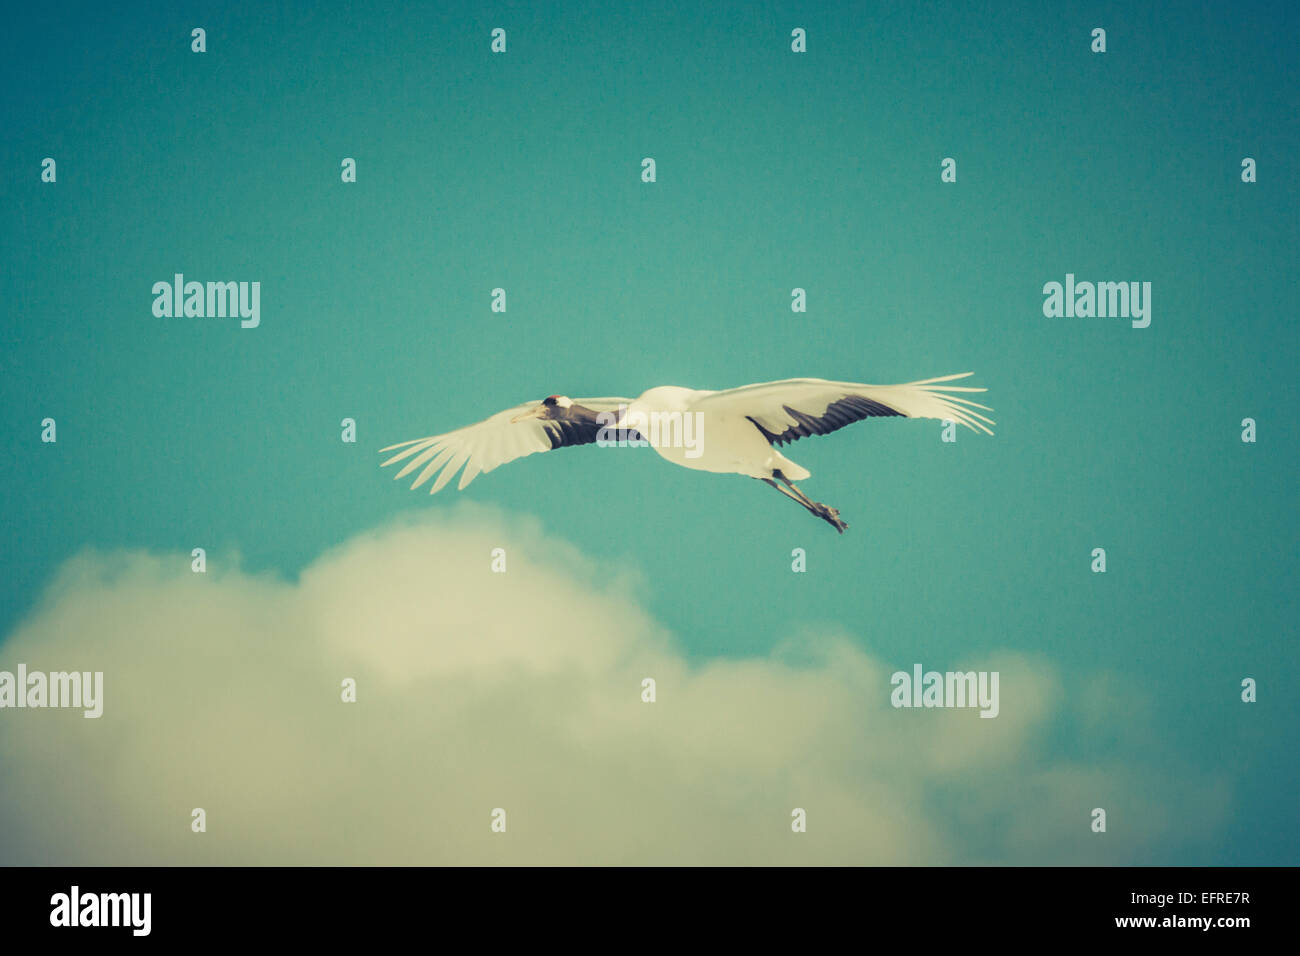 Japanese Red-crowned Crane Flying, Hokkaido, Japan - Stock Image